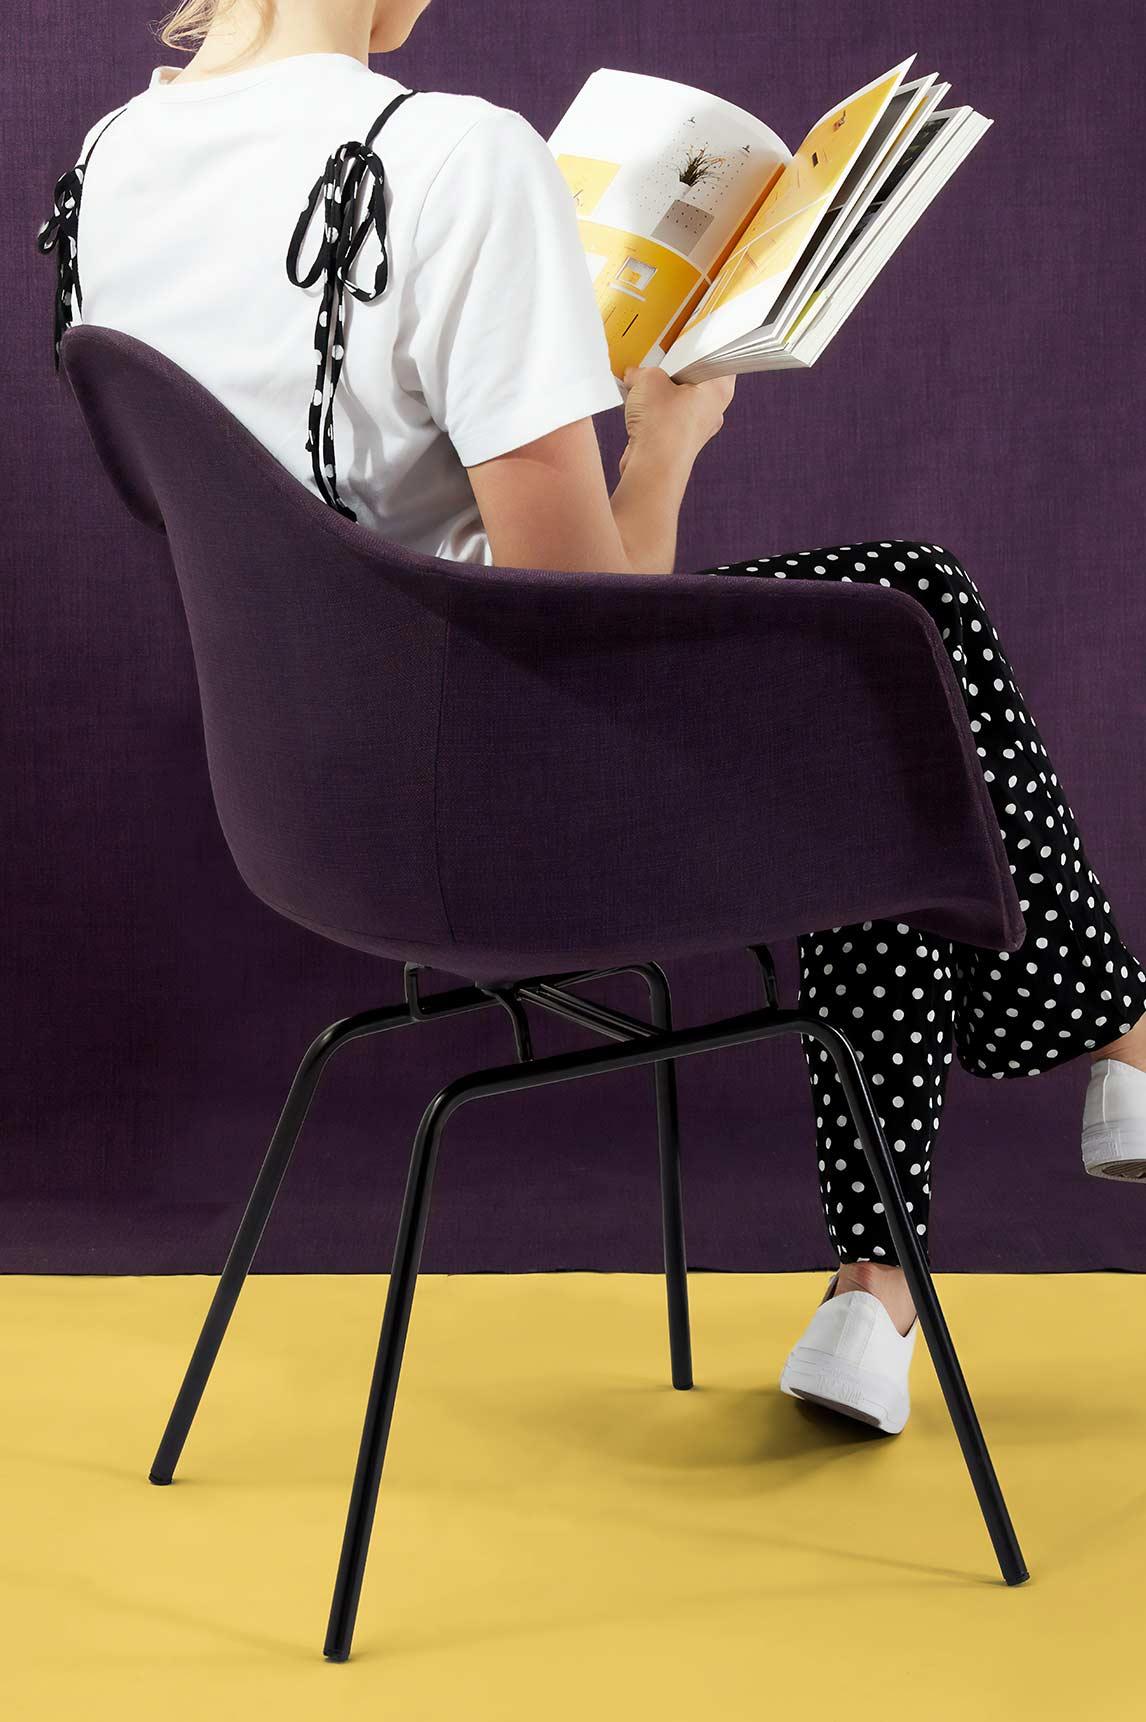 A girl facing towards a wall sat on a chair reading a book